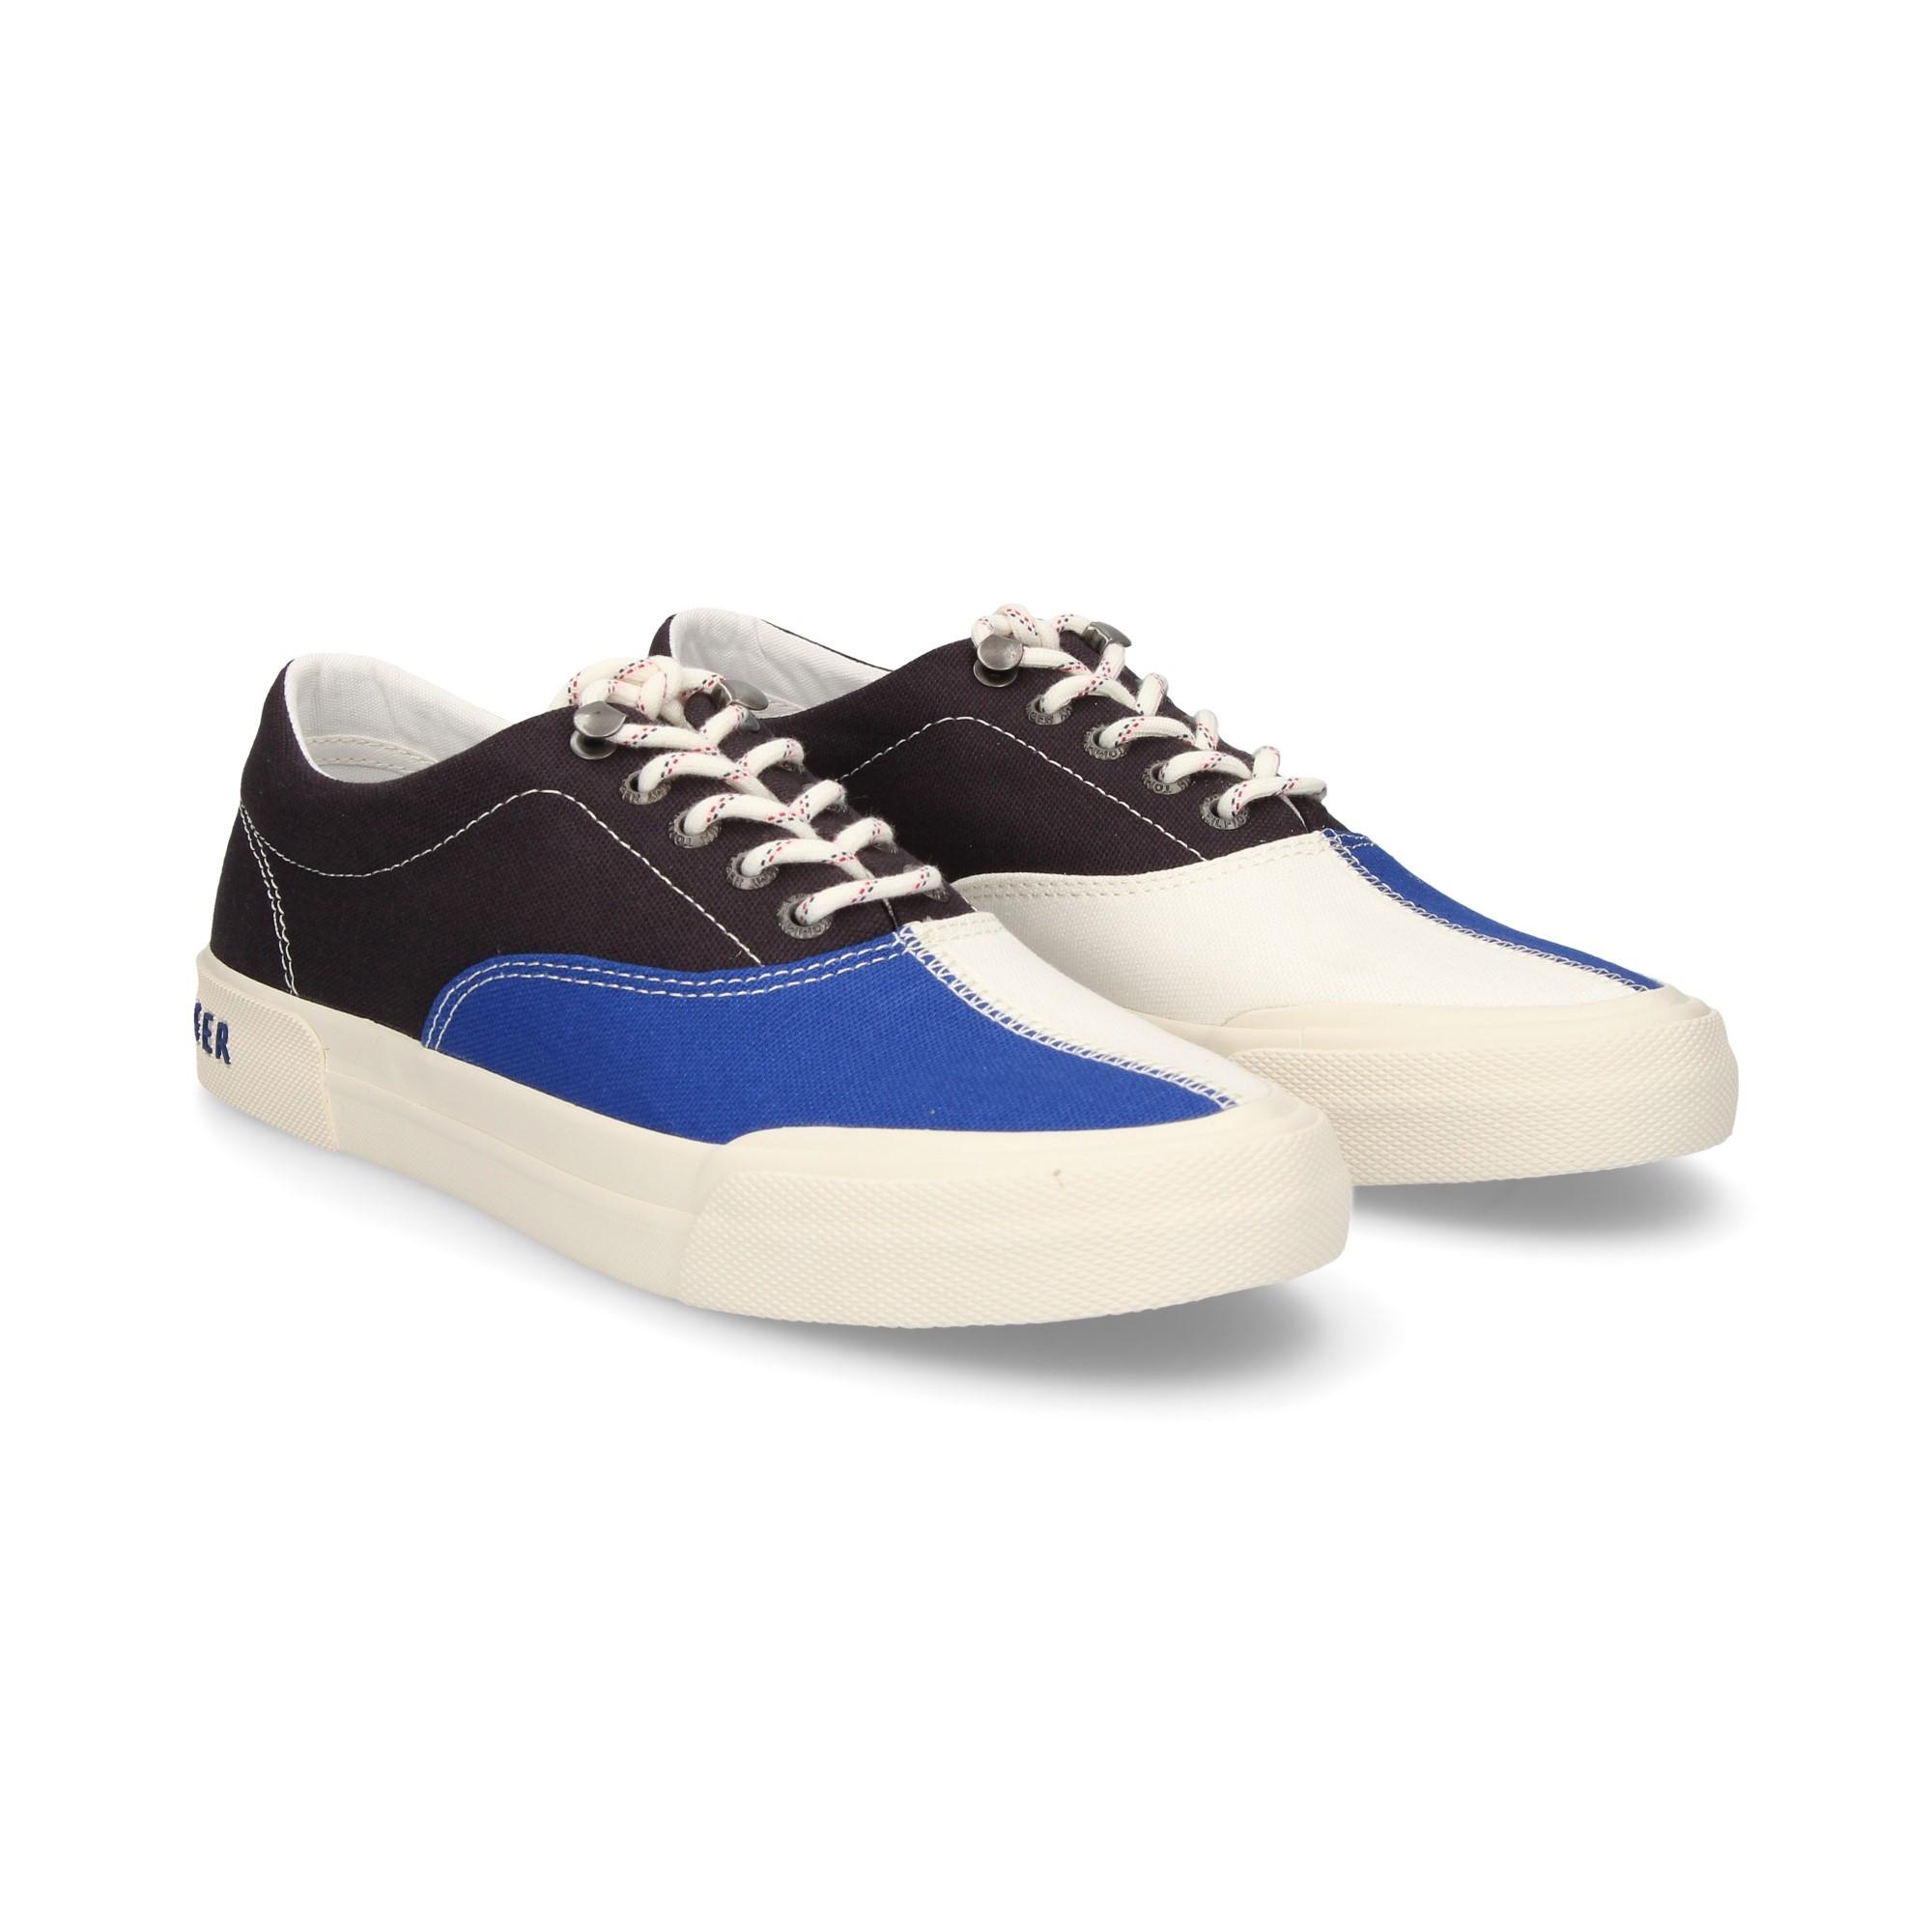 deportivo-textil-azul-azulon